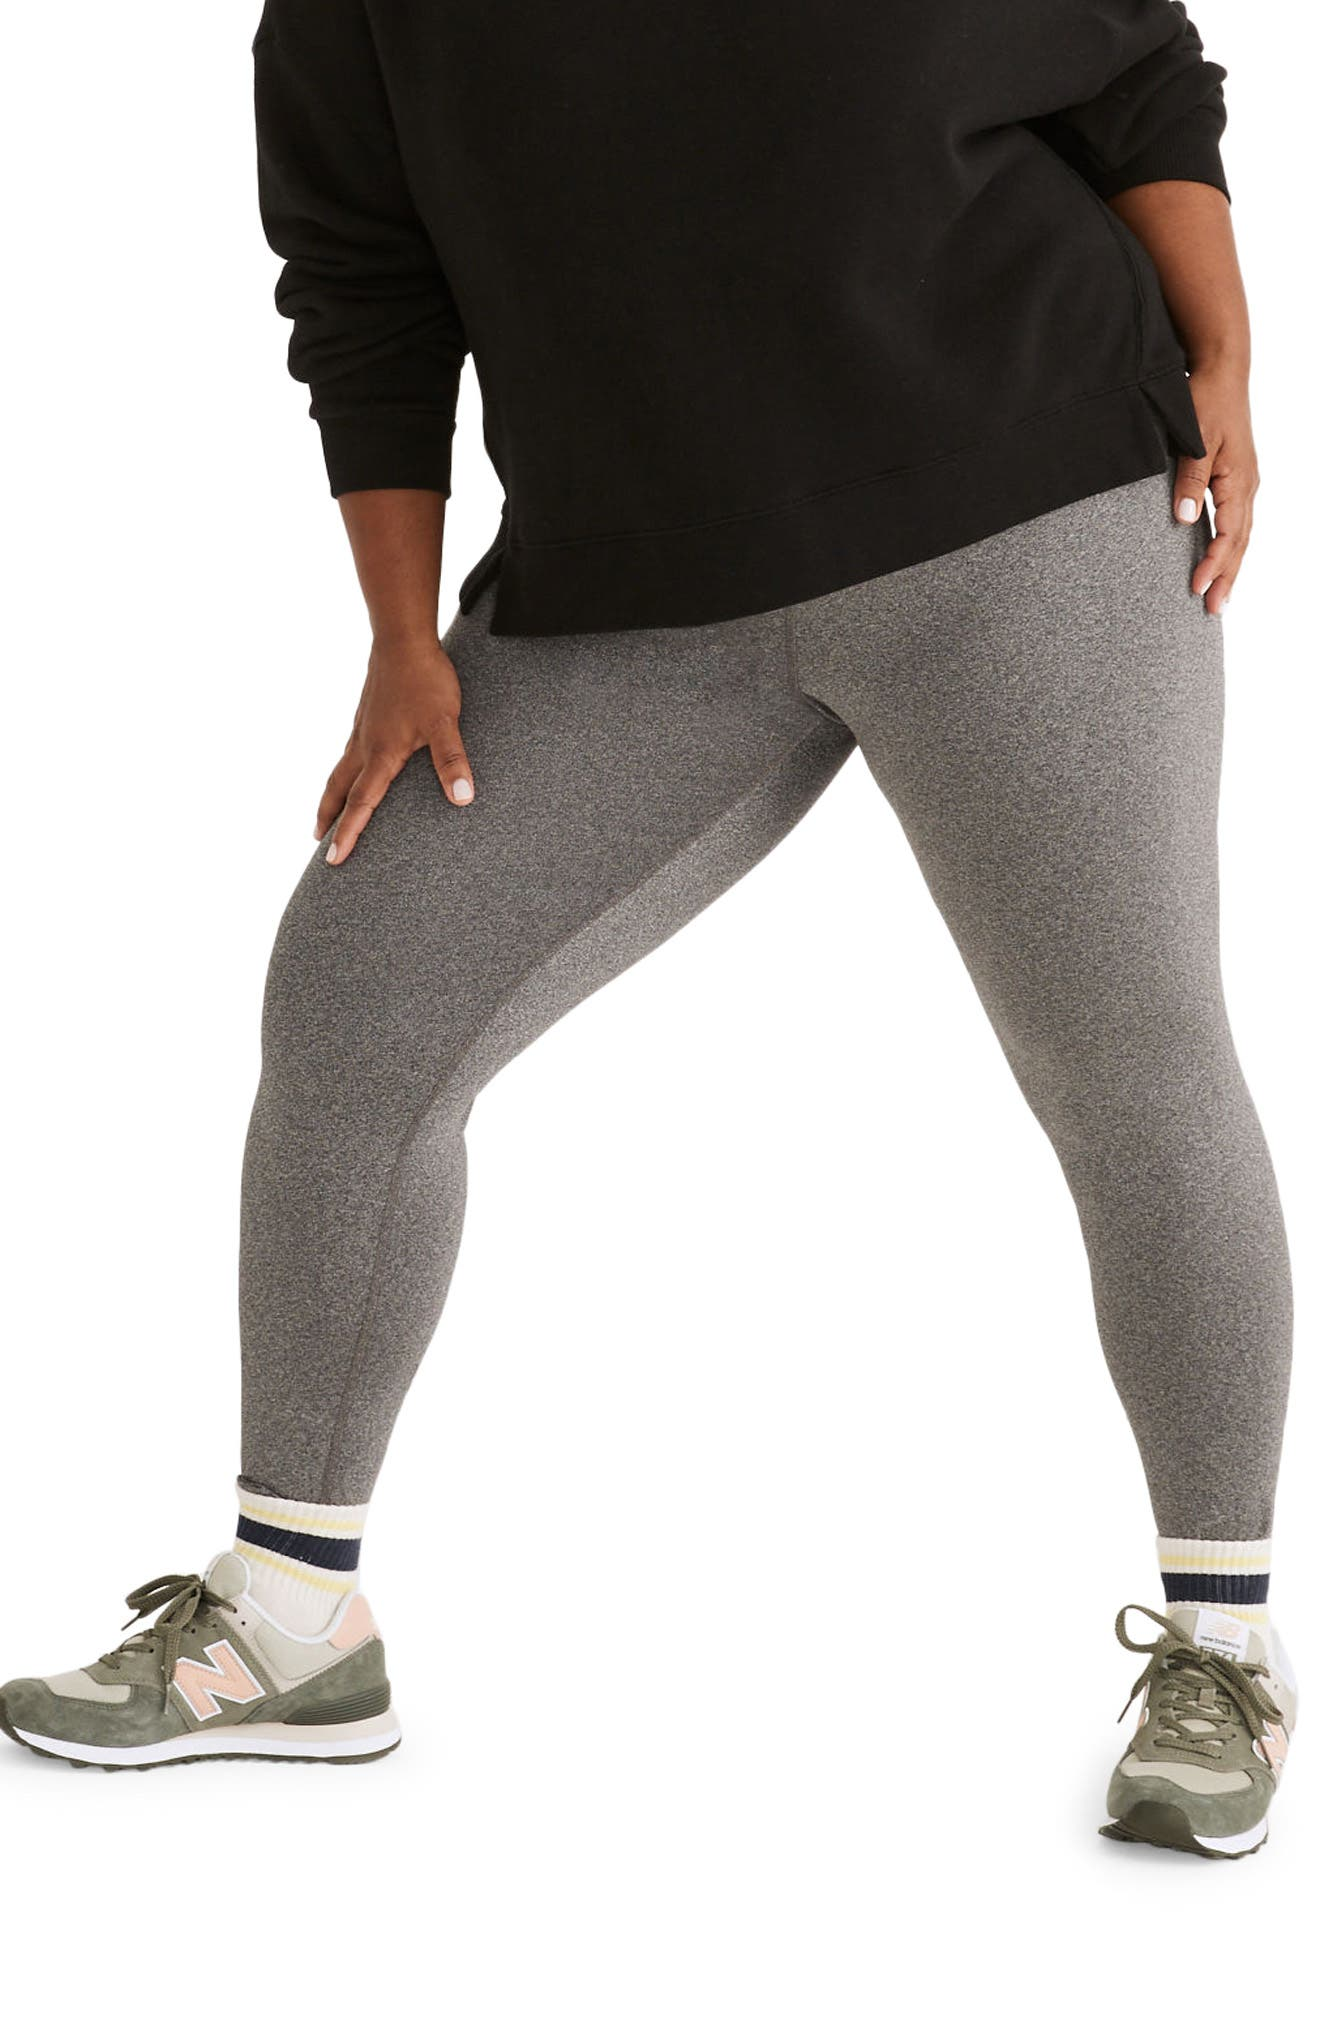 Form High Waist Leggings